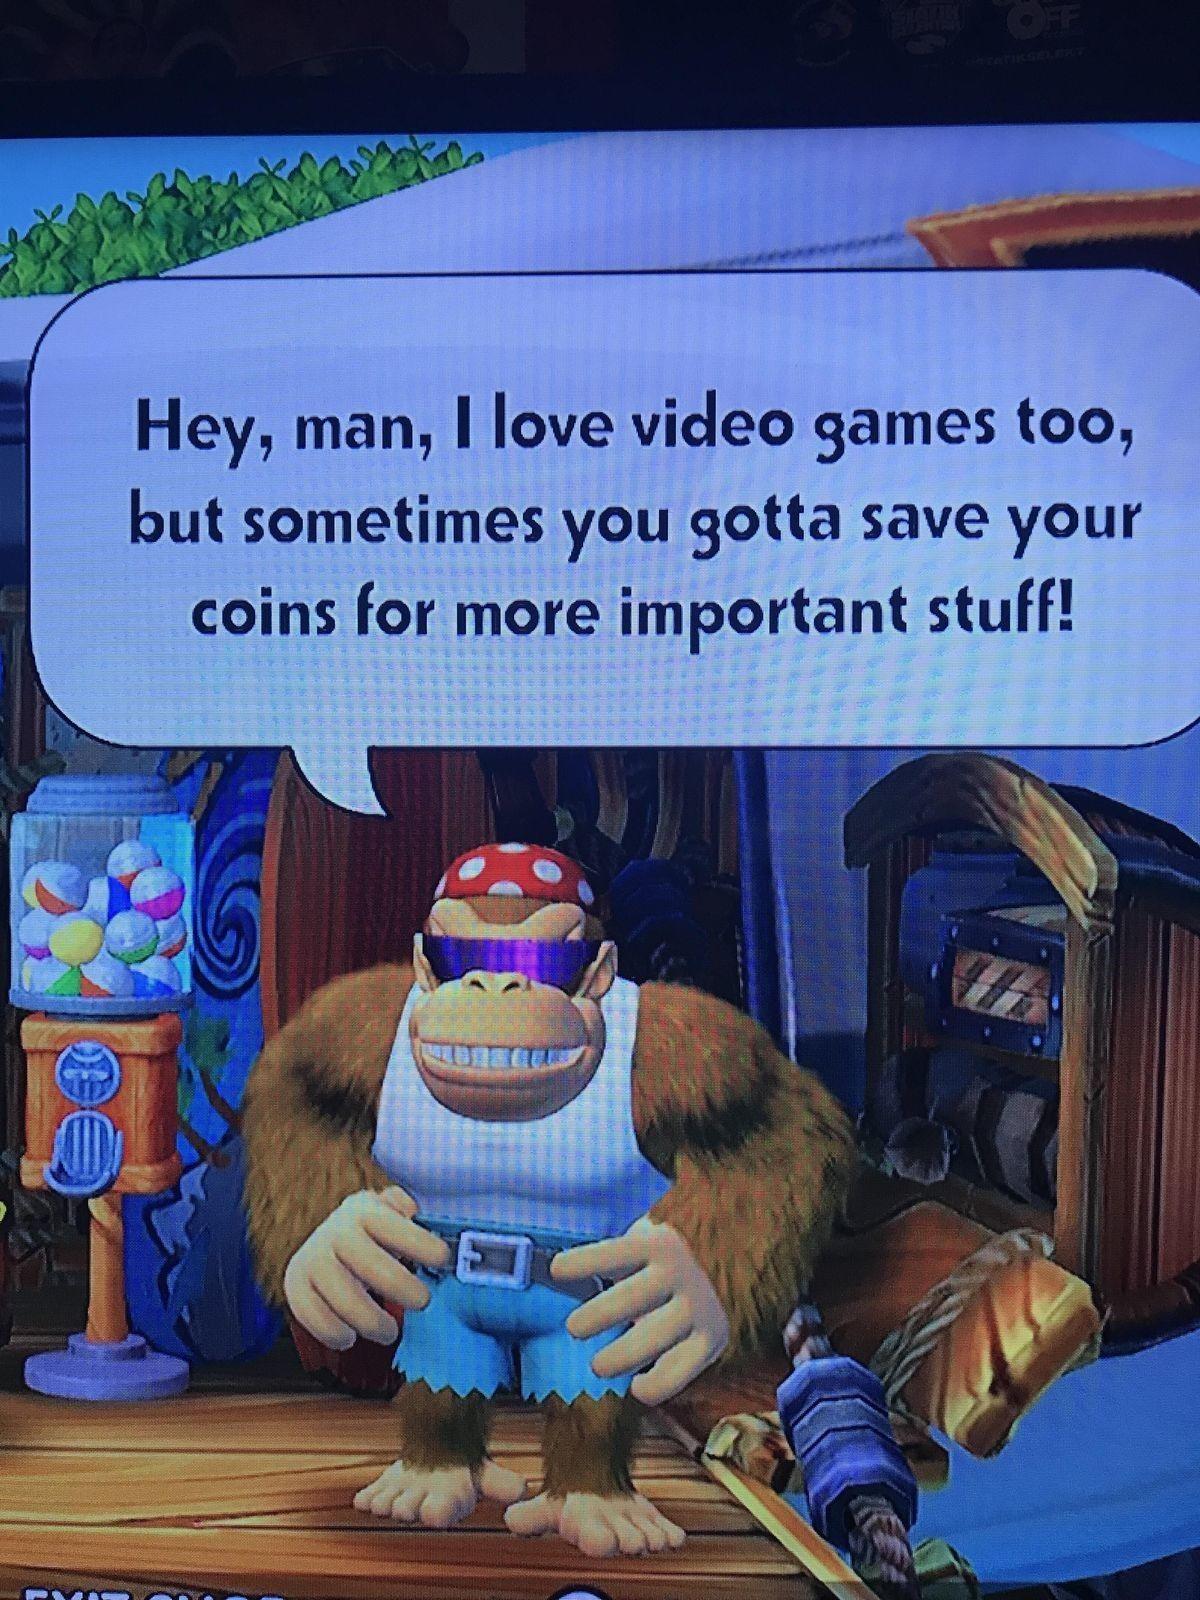 funky kong says